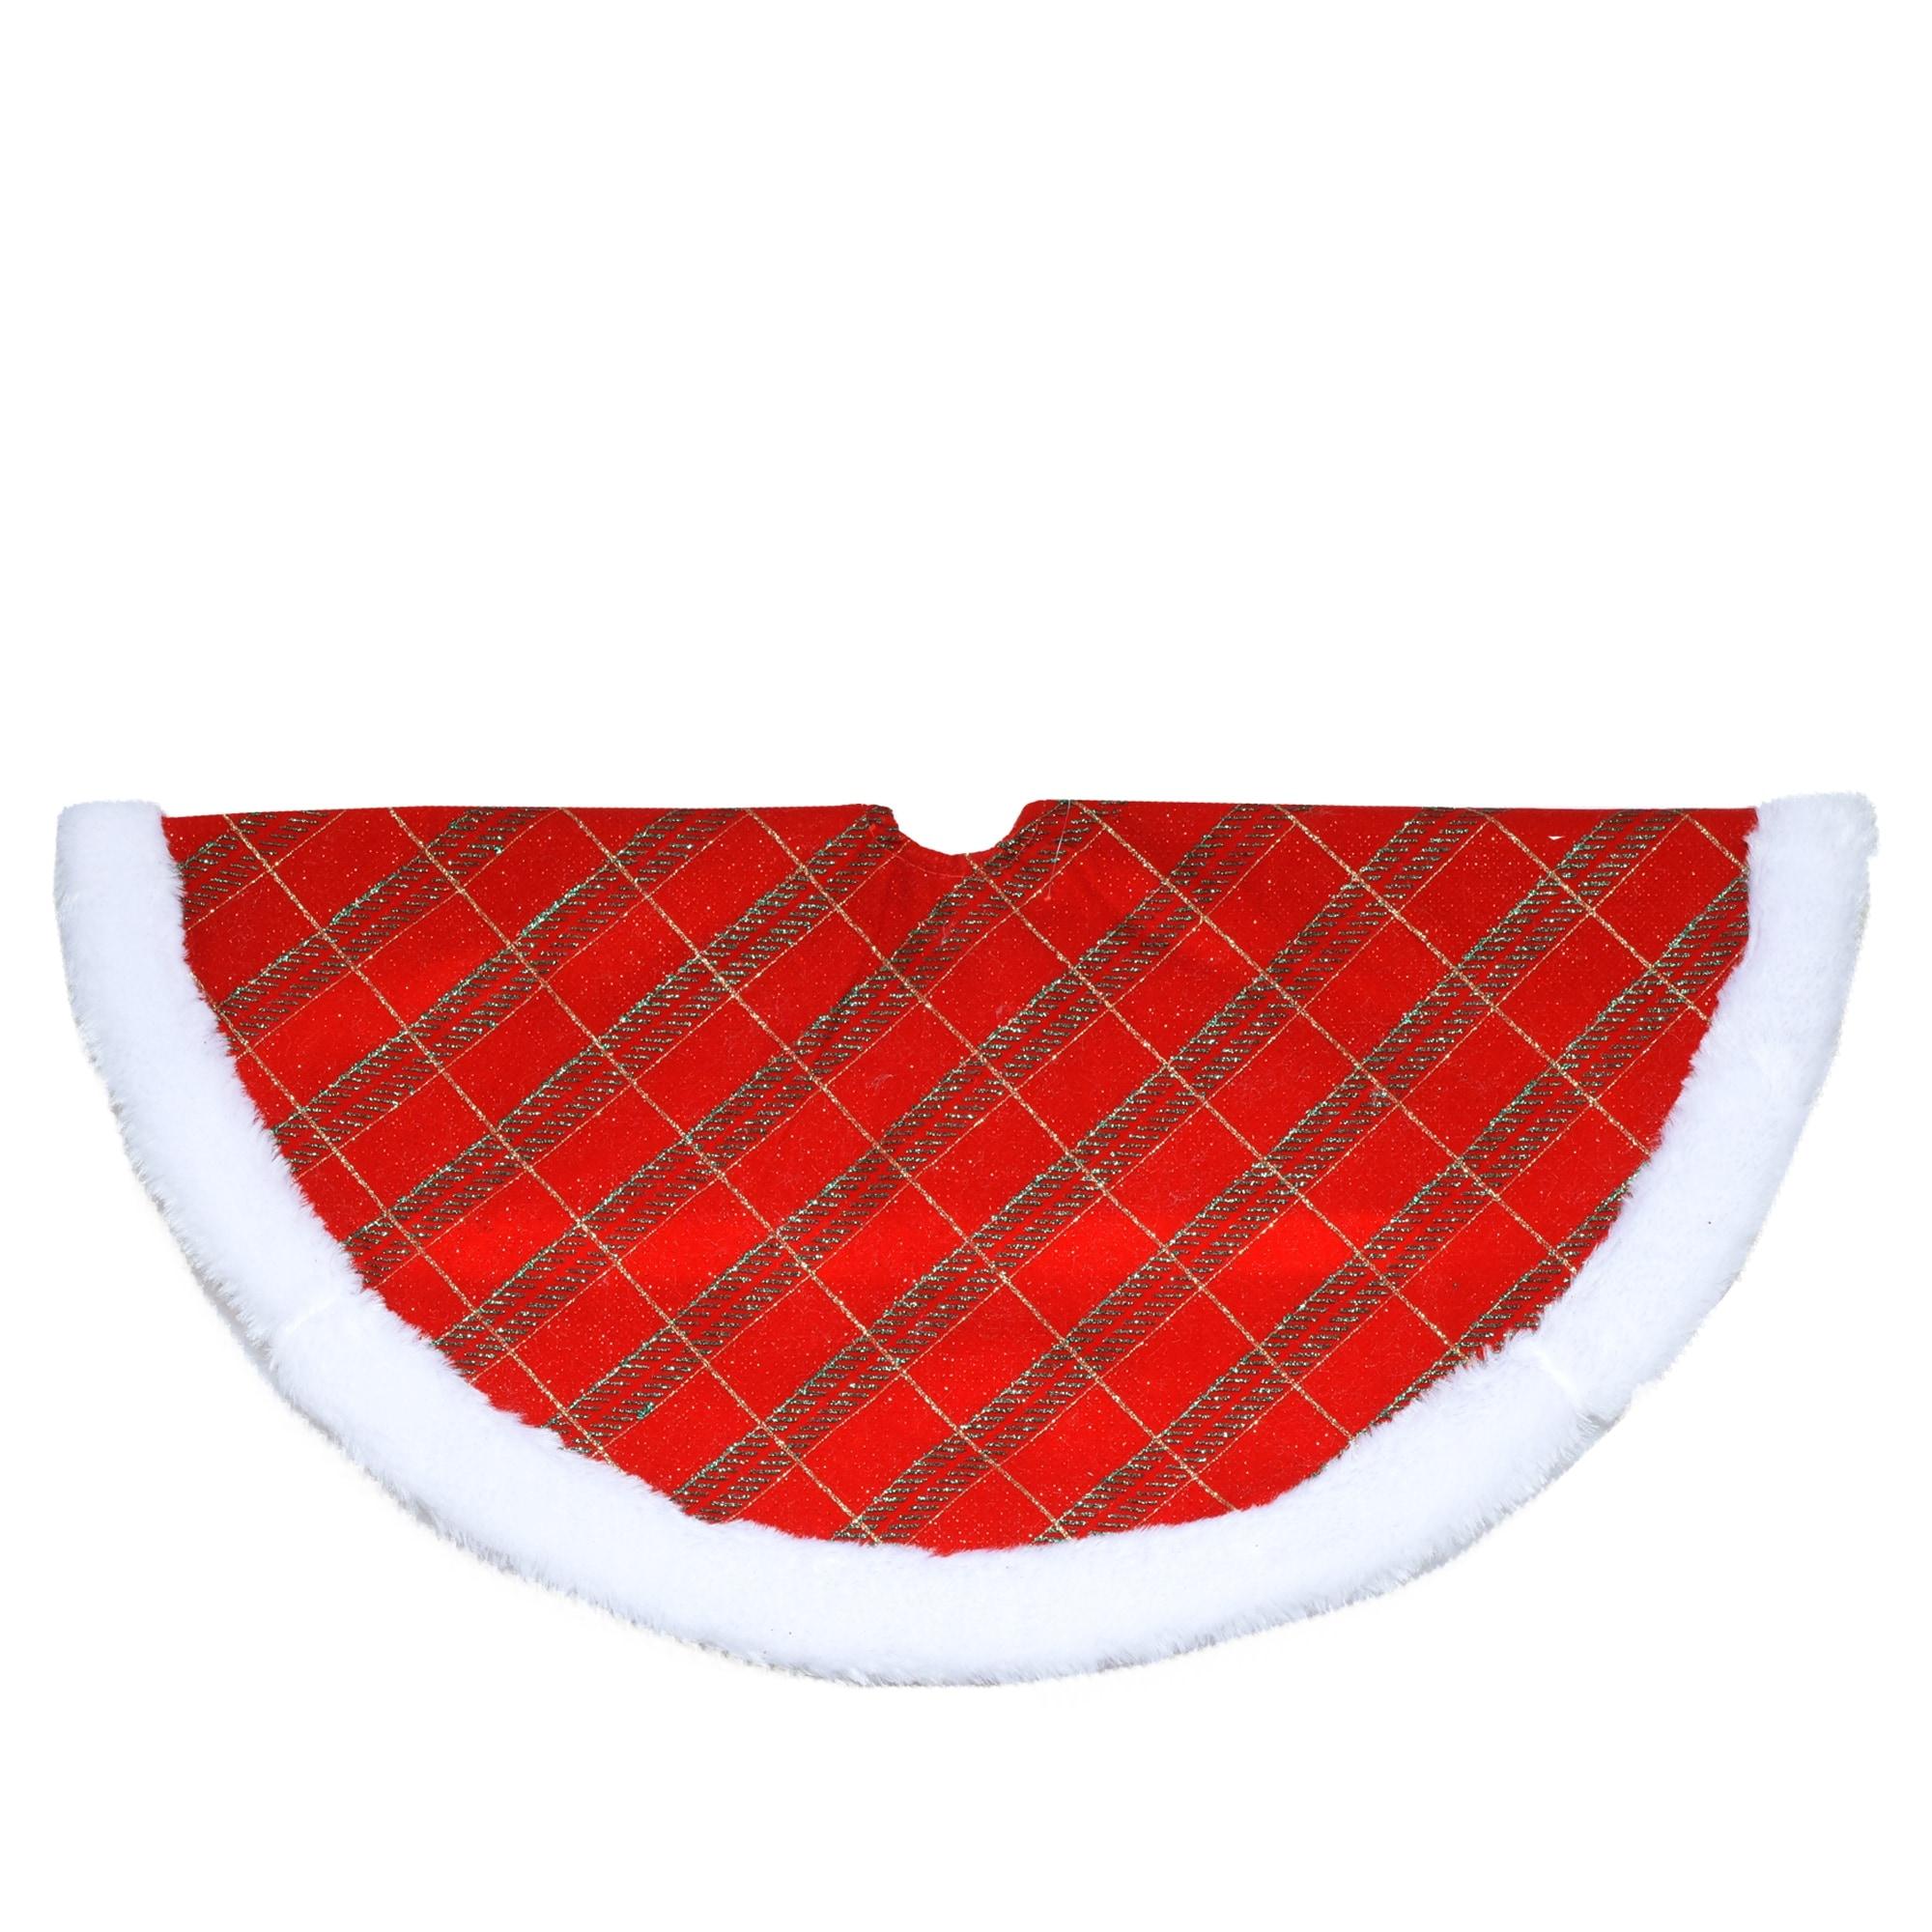 Mini Christmas Tree Skirt Pattern.20 Red Green And Gold Glittered Mini Christmas Tree Skirt With Faux Fur Border